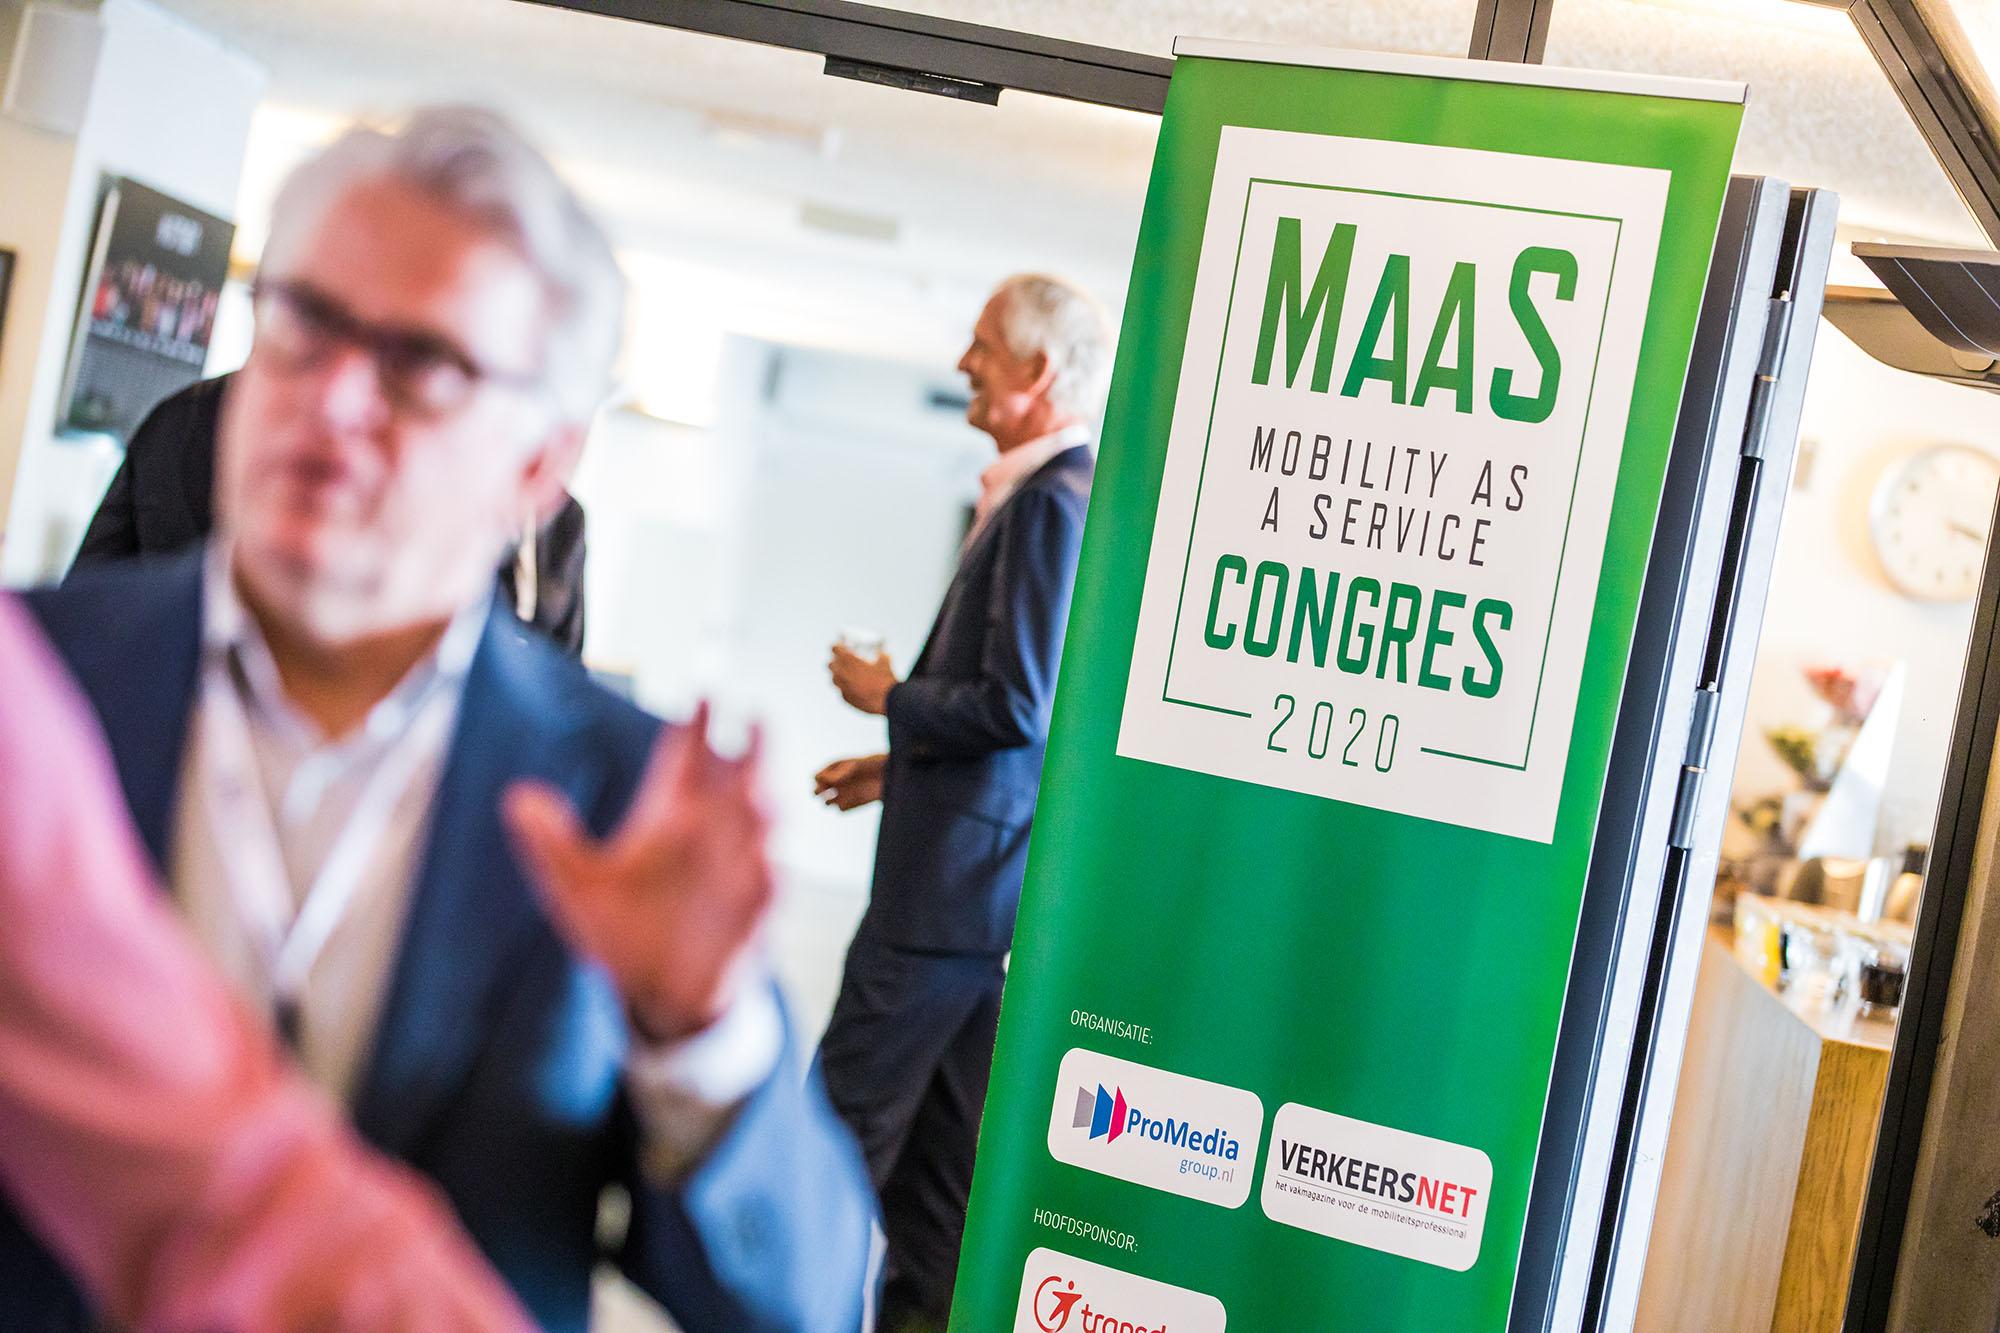 MaaS Congres Amsterdam 2020